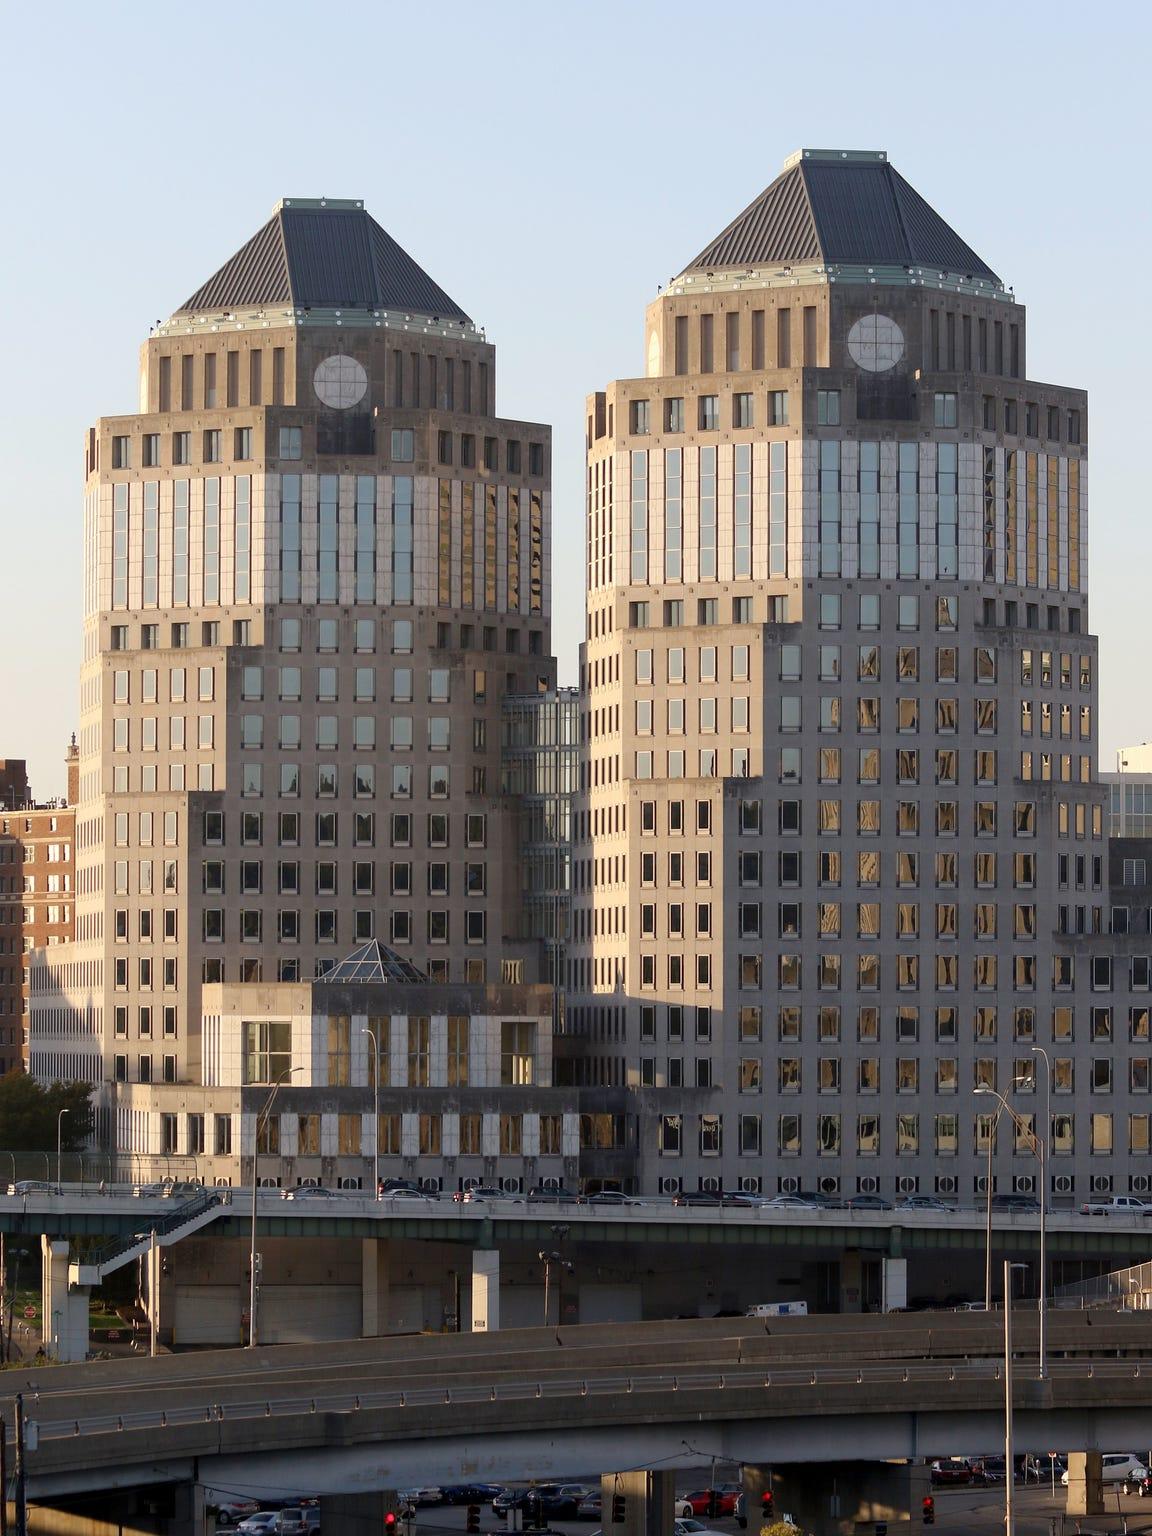 Procter & Gamble is based in Cincinnati.